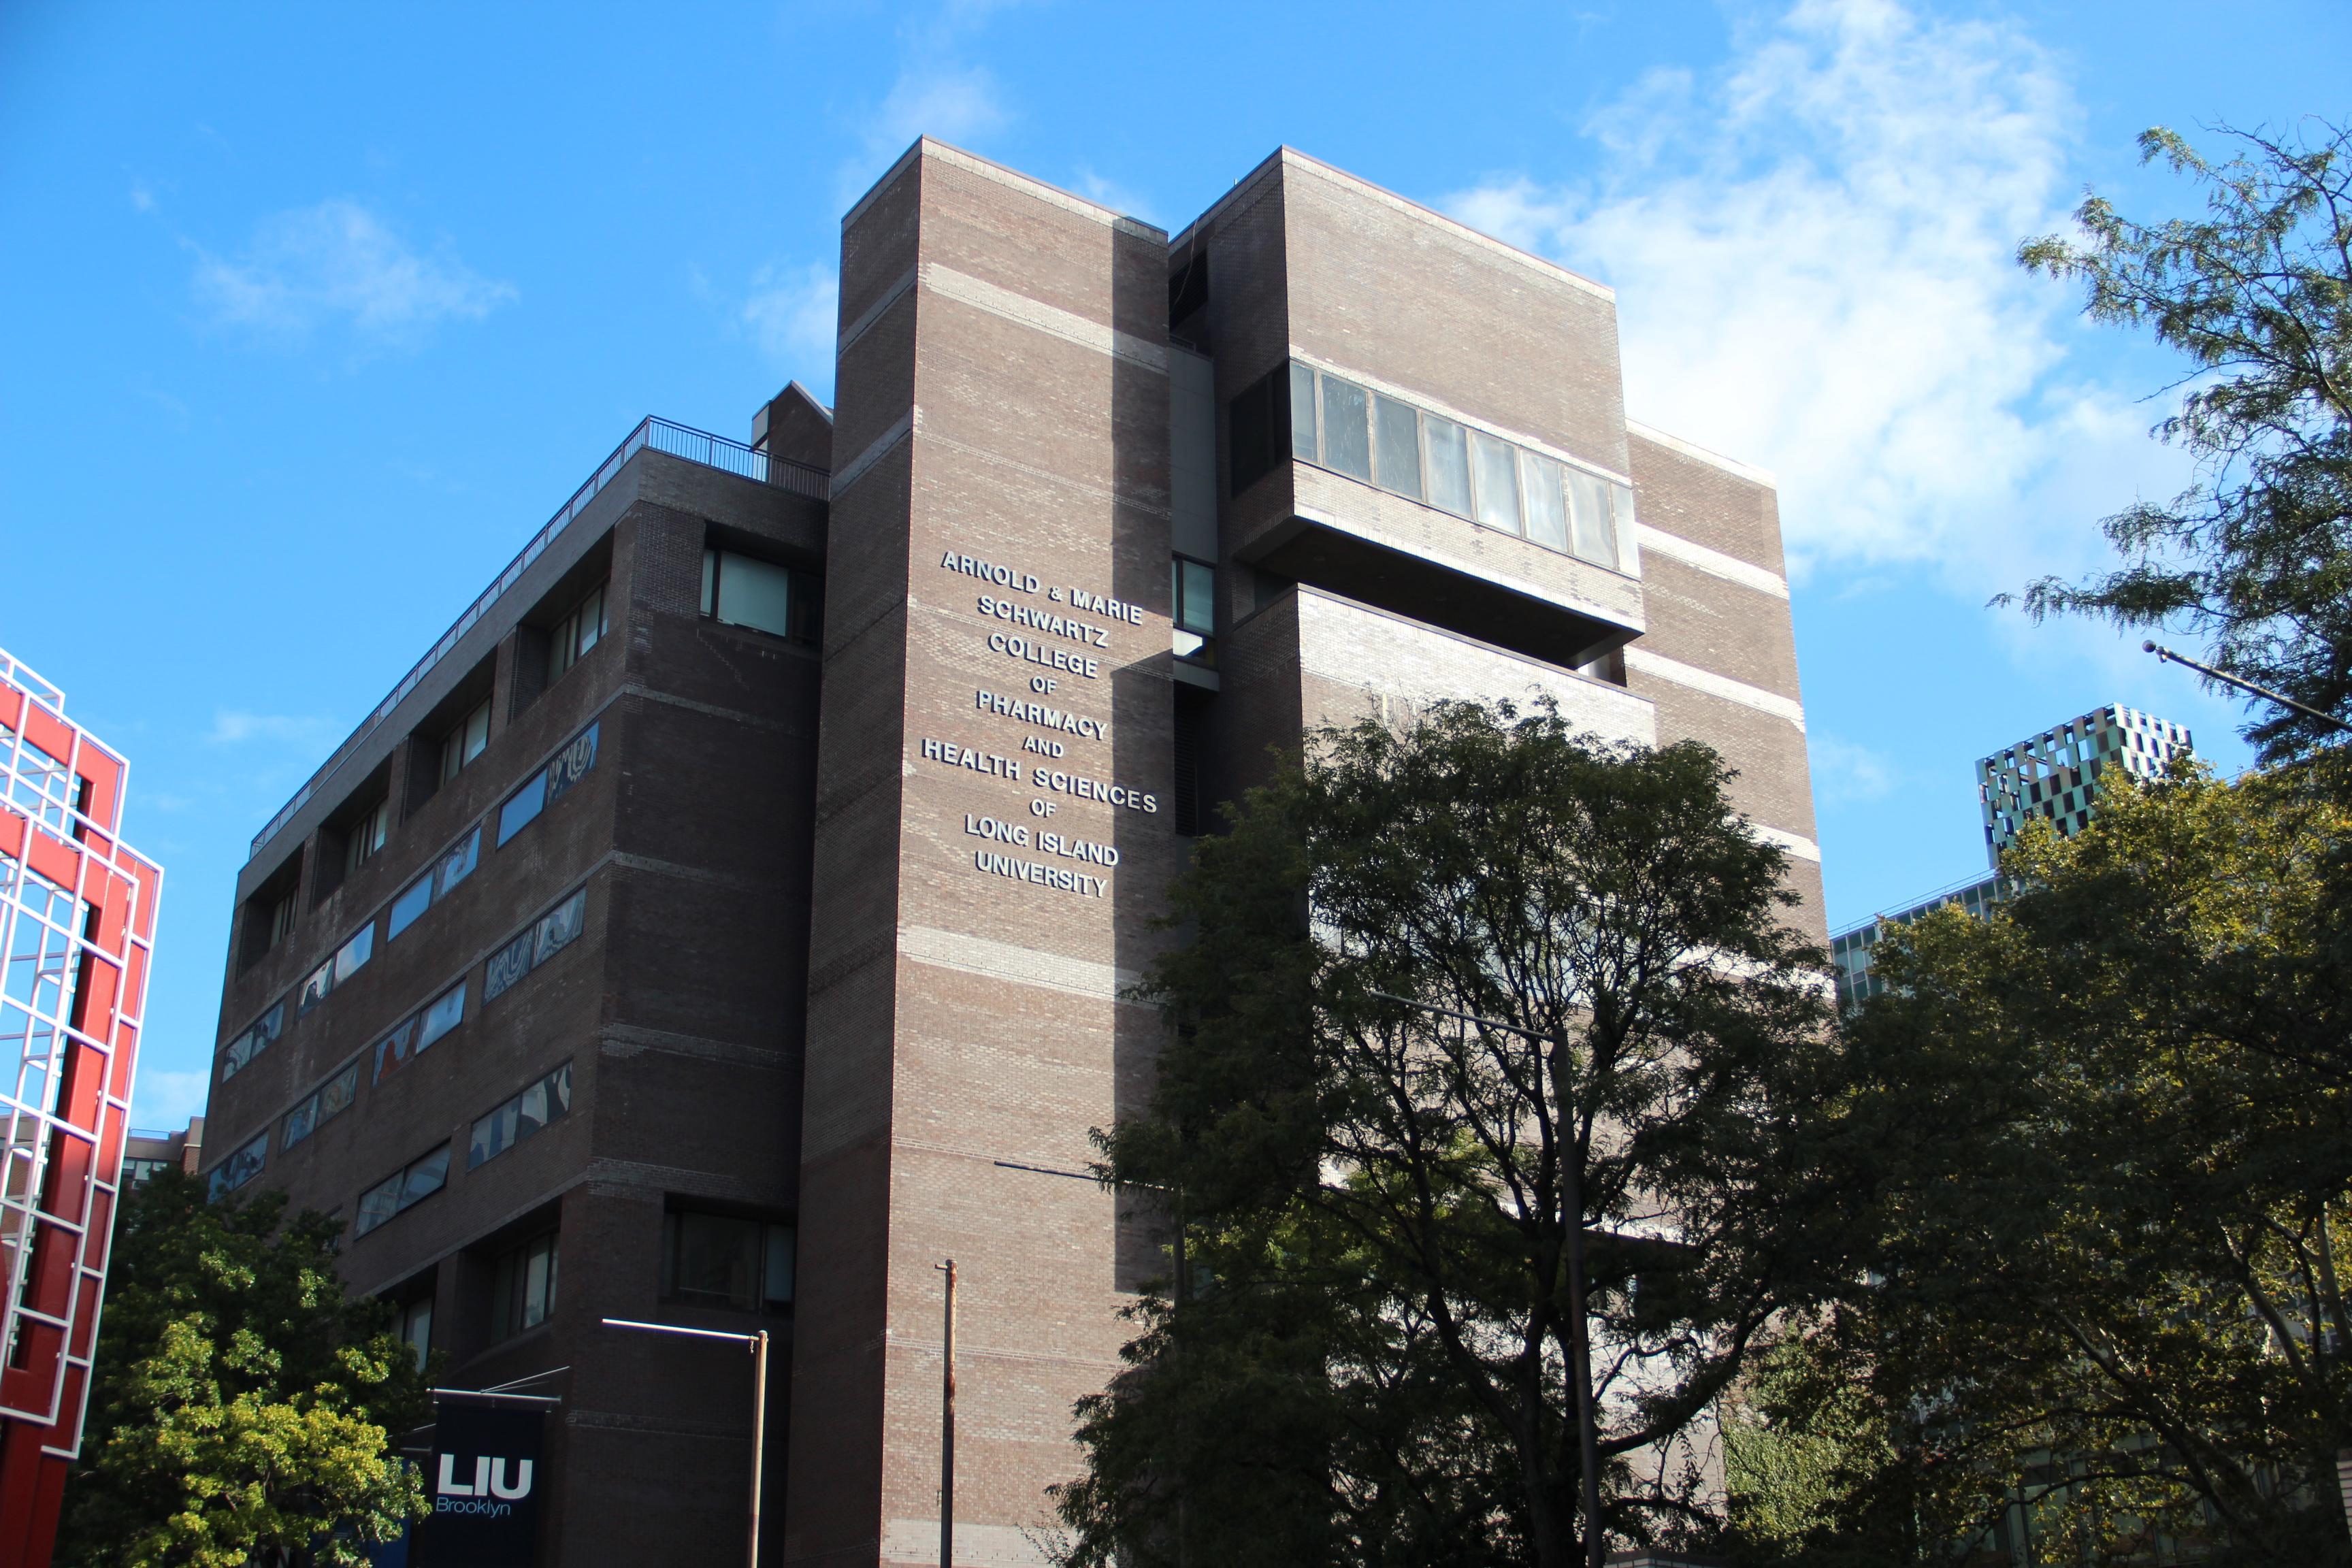 LIU Brooklyn Requirements for Admission